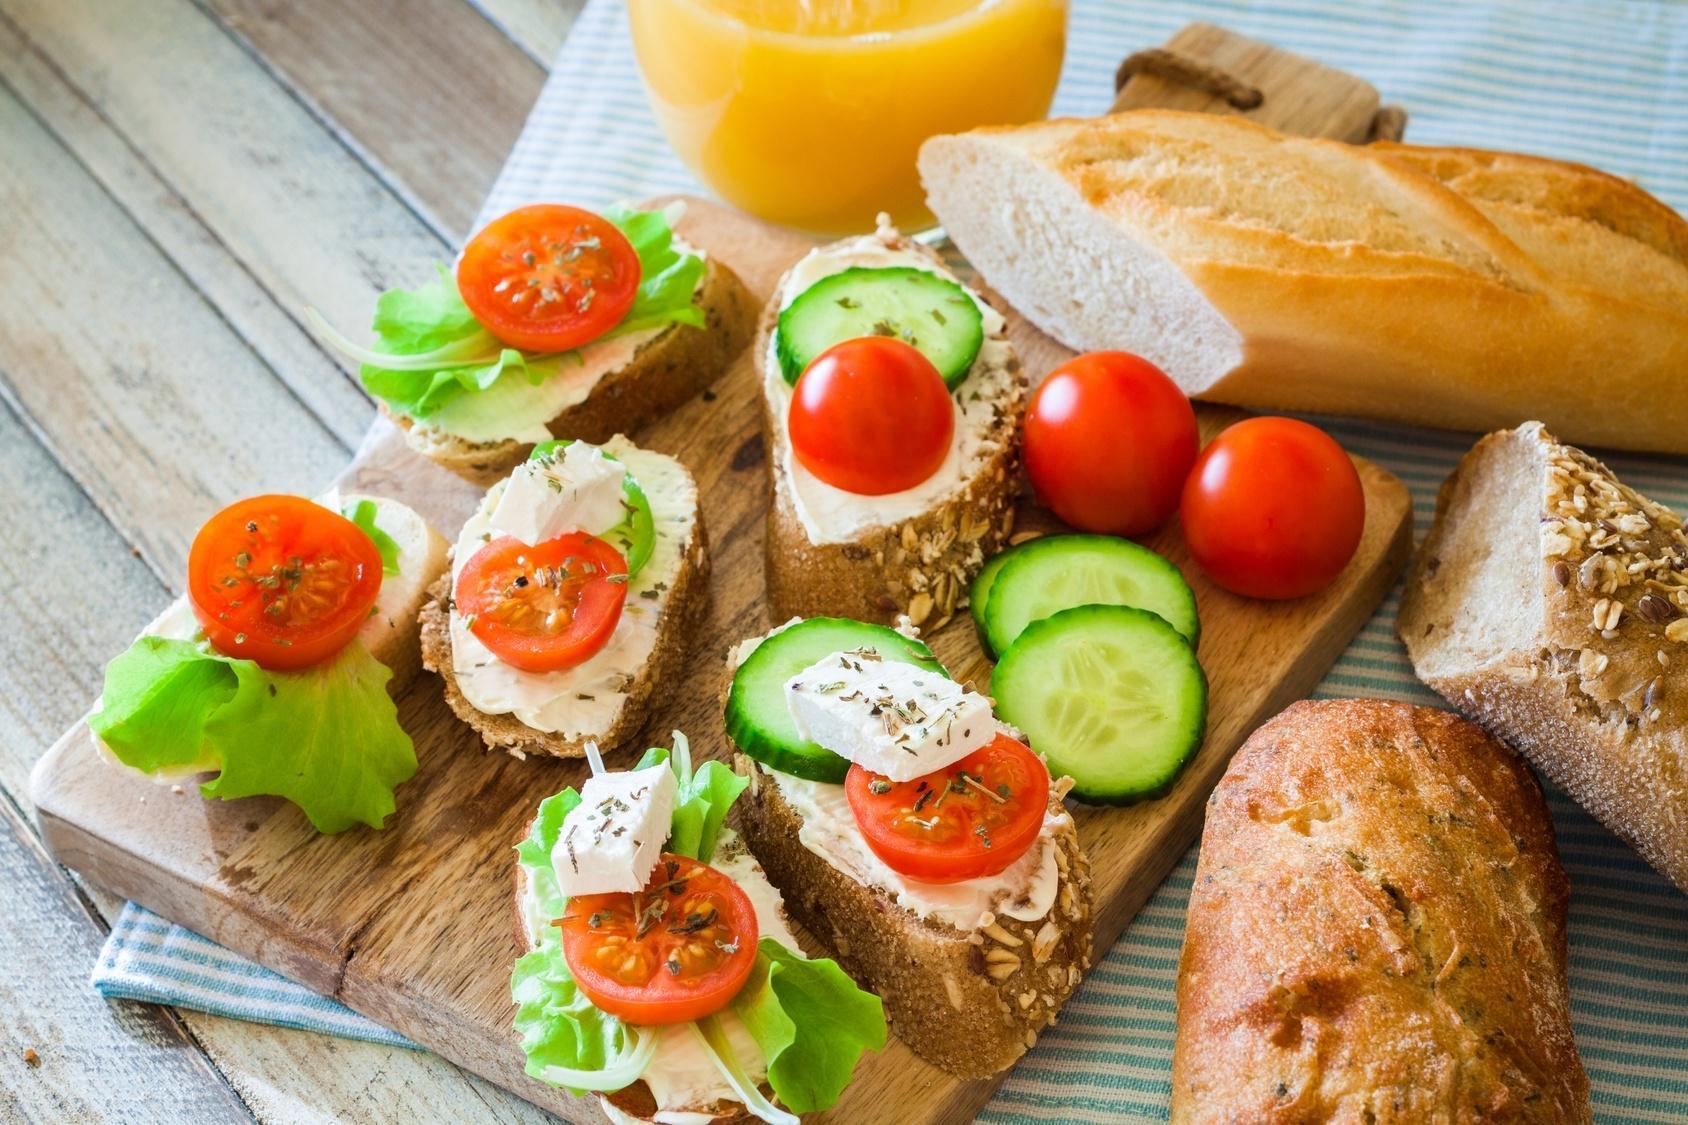 Seis Receitas de Sanduíches Saudáveis e Ricos para a Dieta